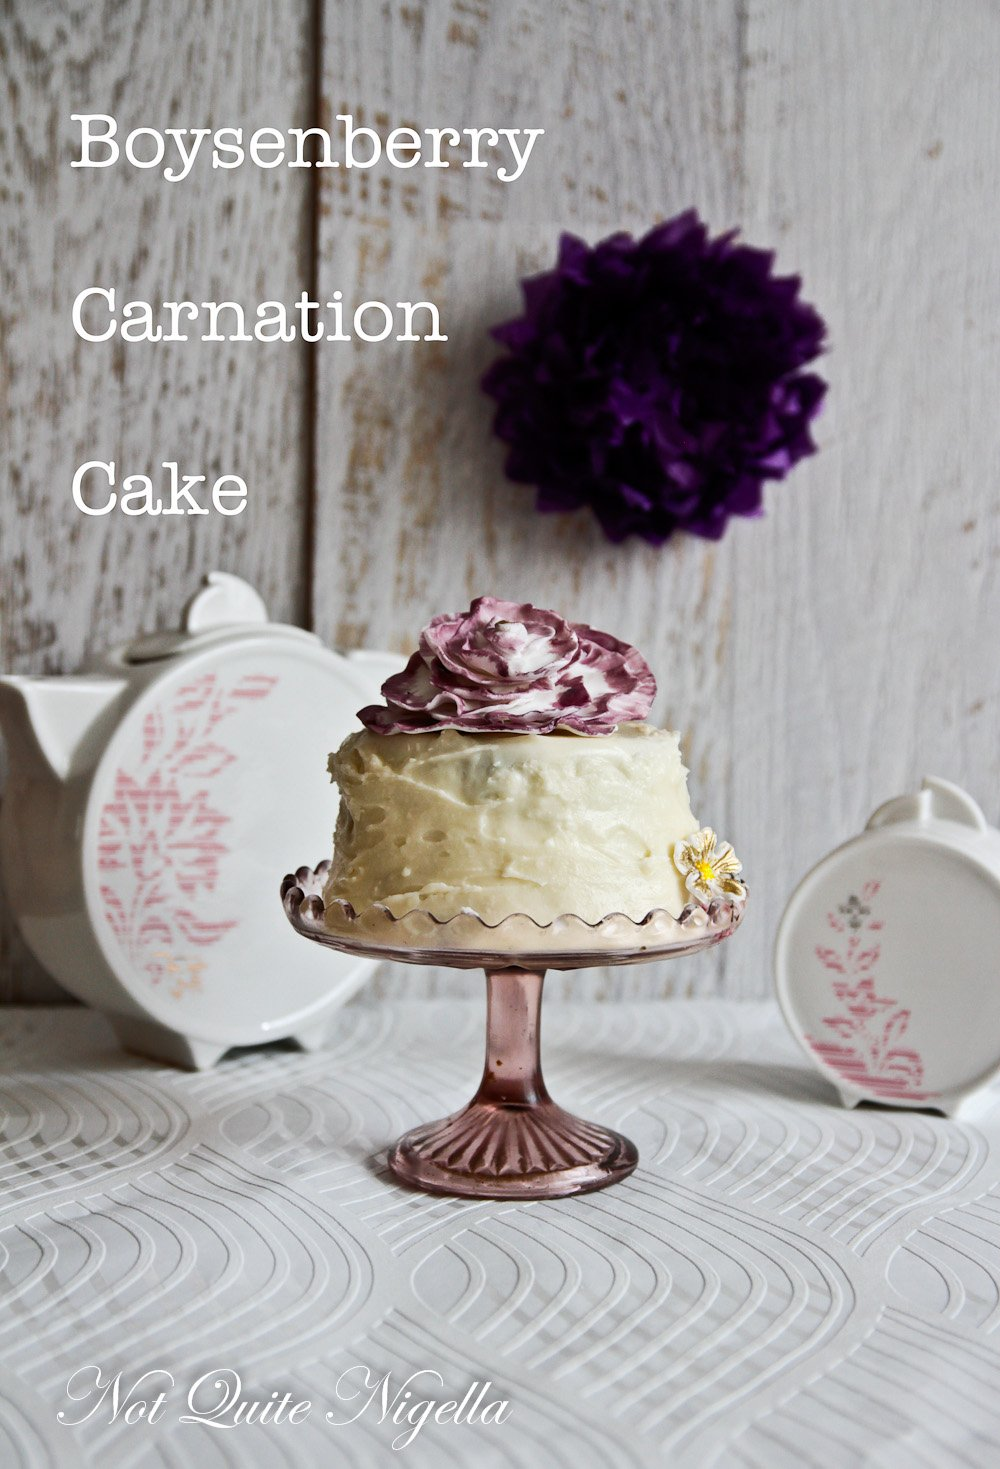 Boysenberry Cake